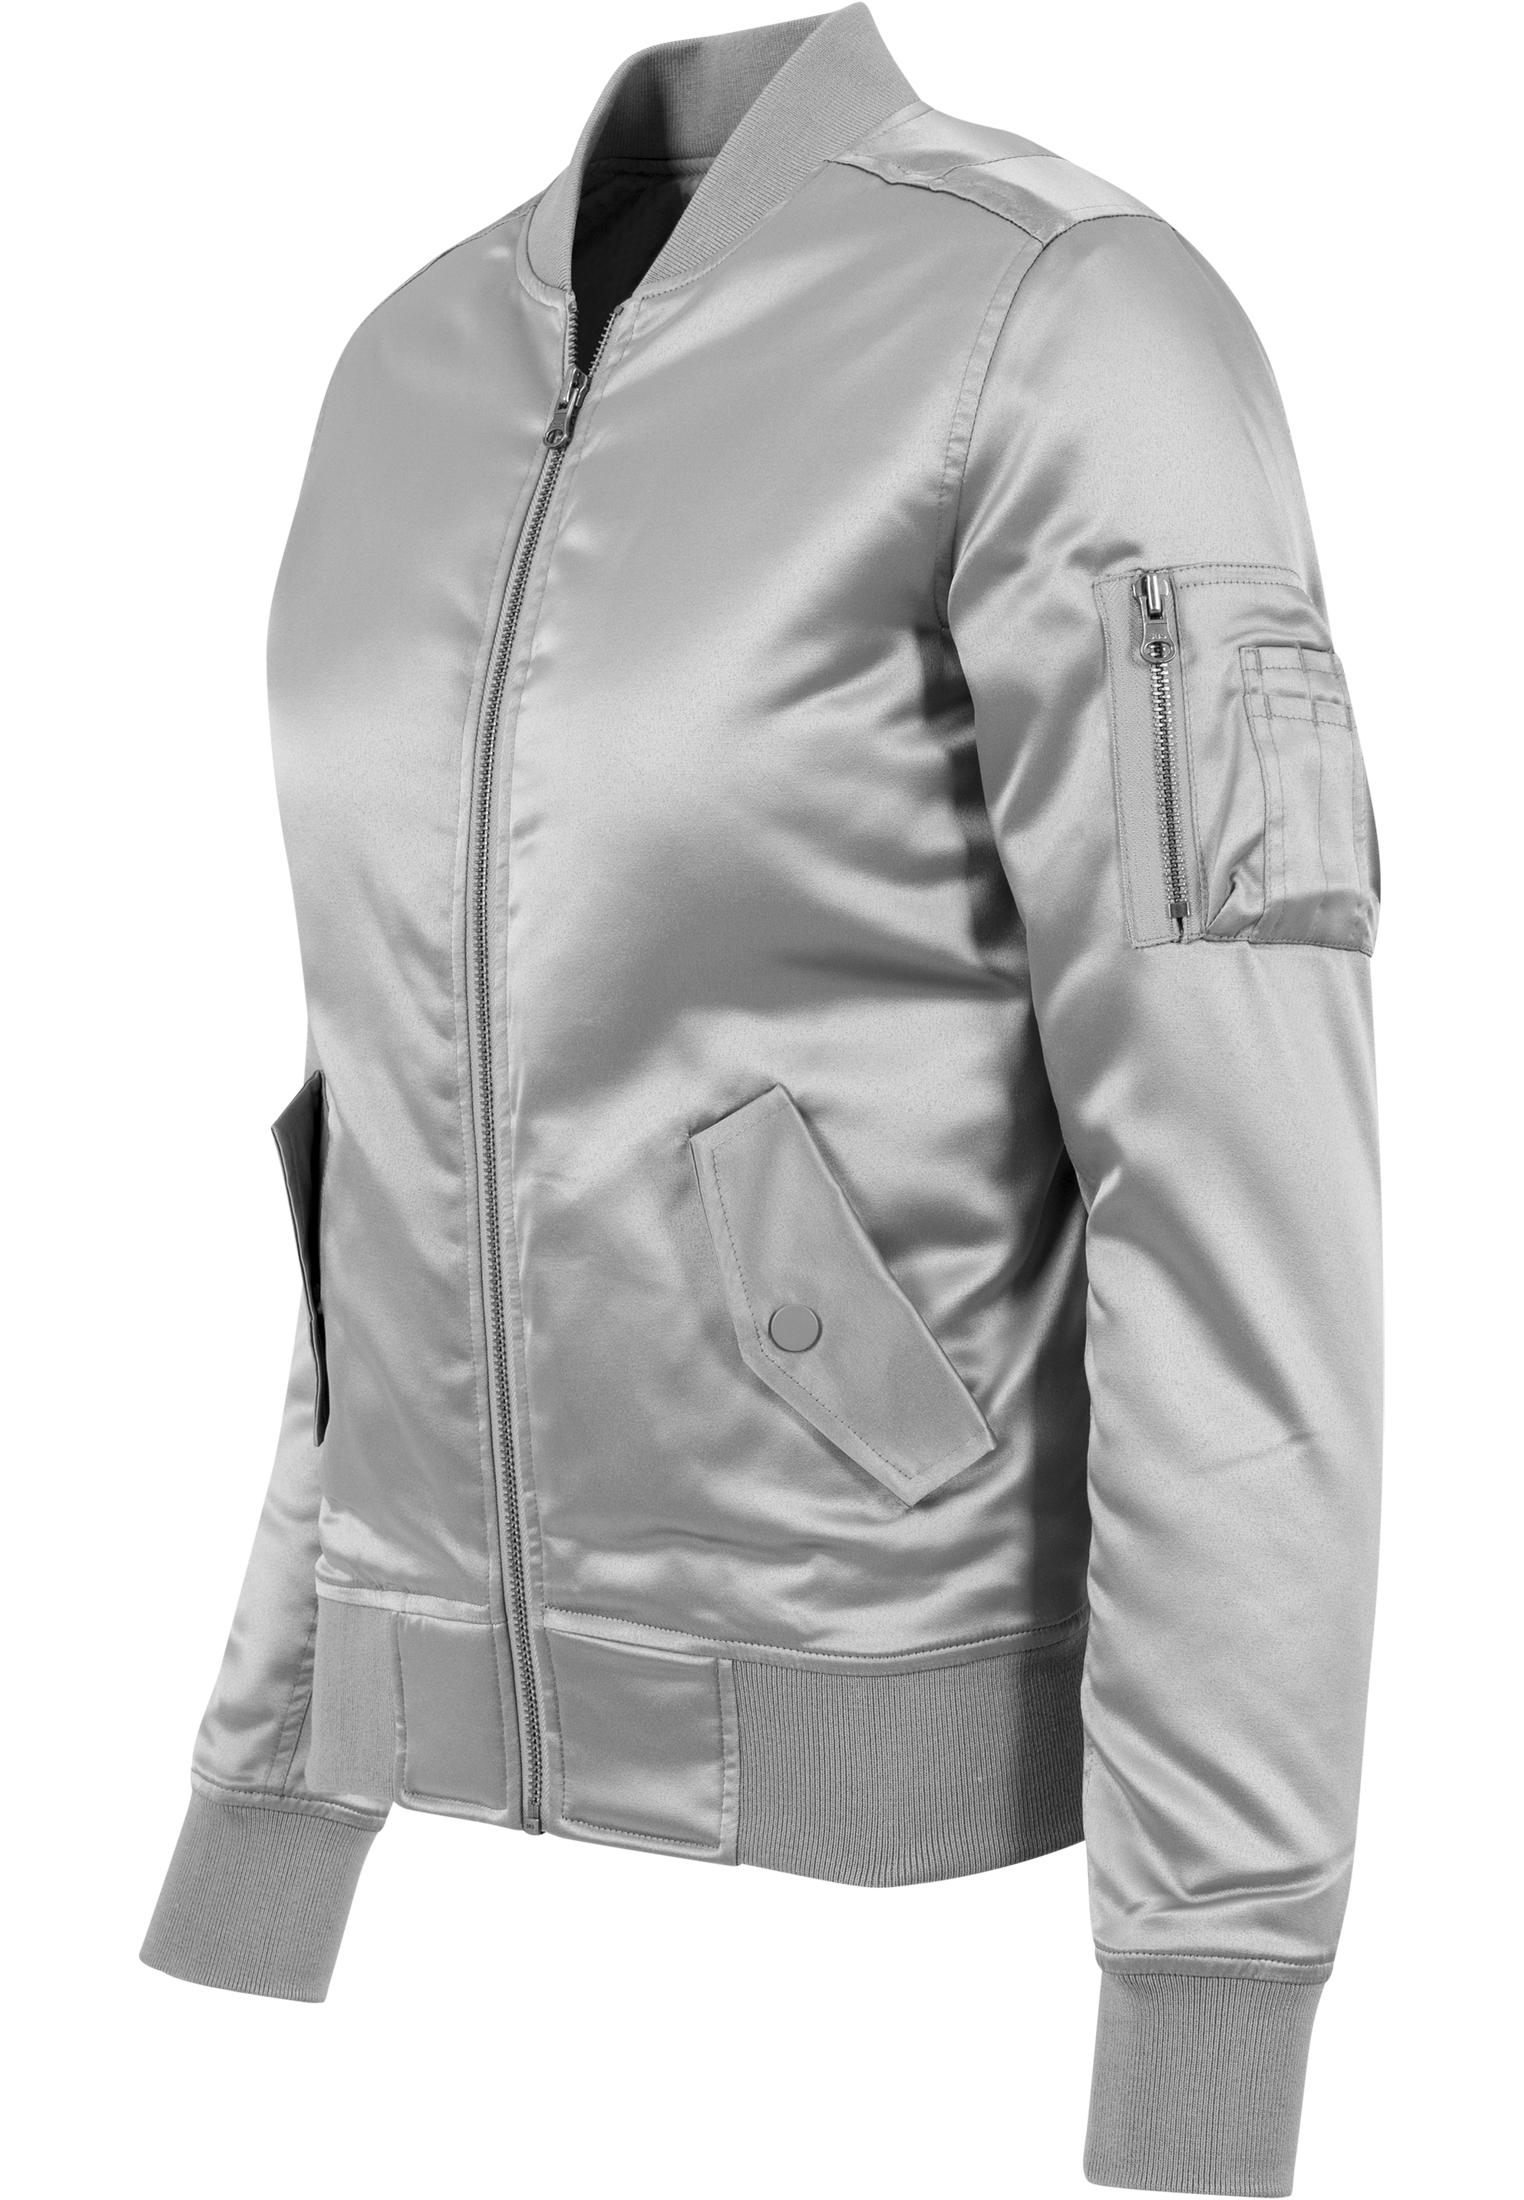 Urban Classics Damen Jacke Ladies Light Bomber Jacket